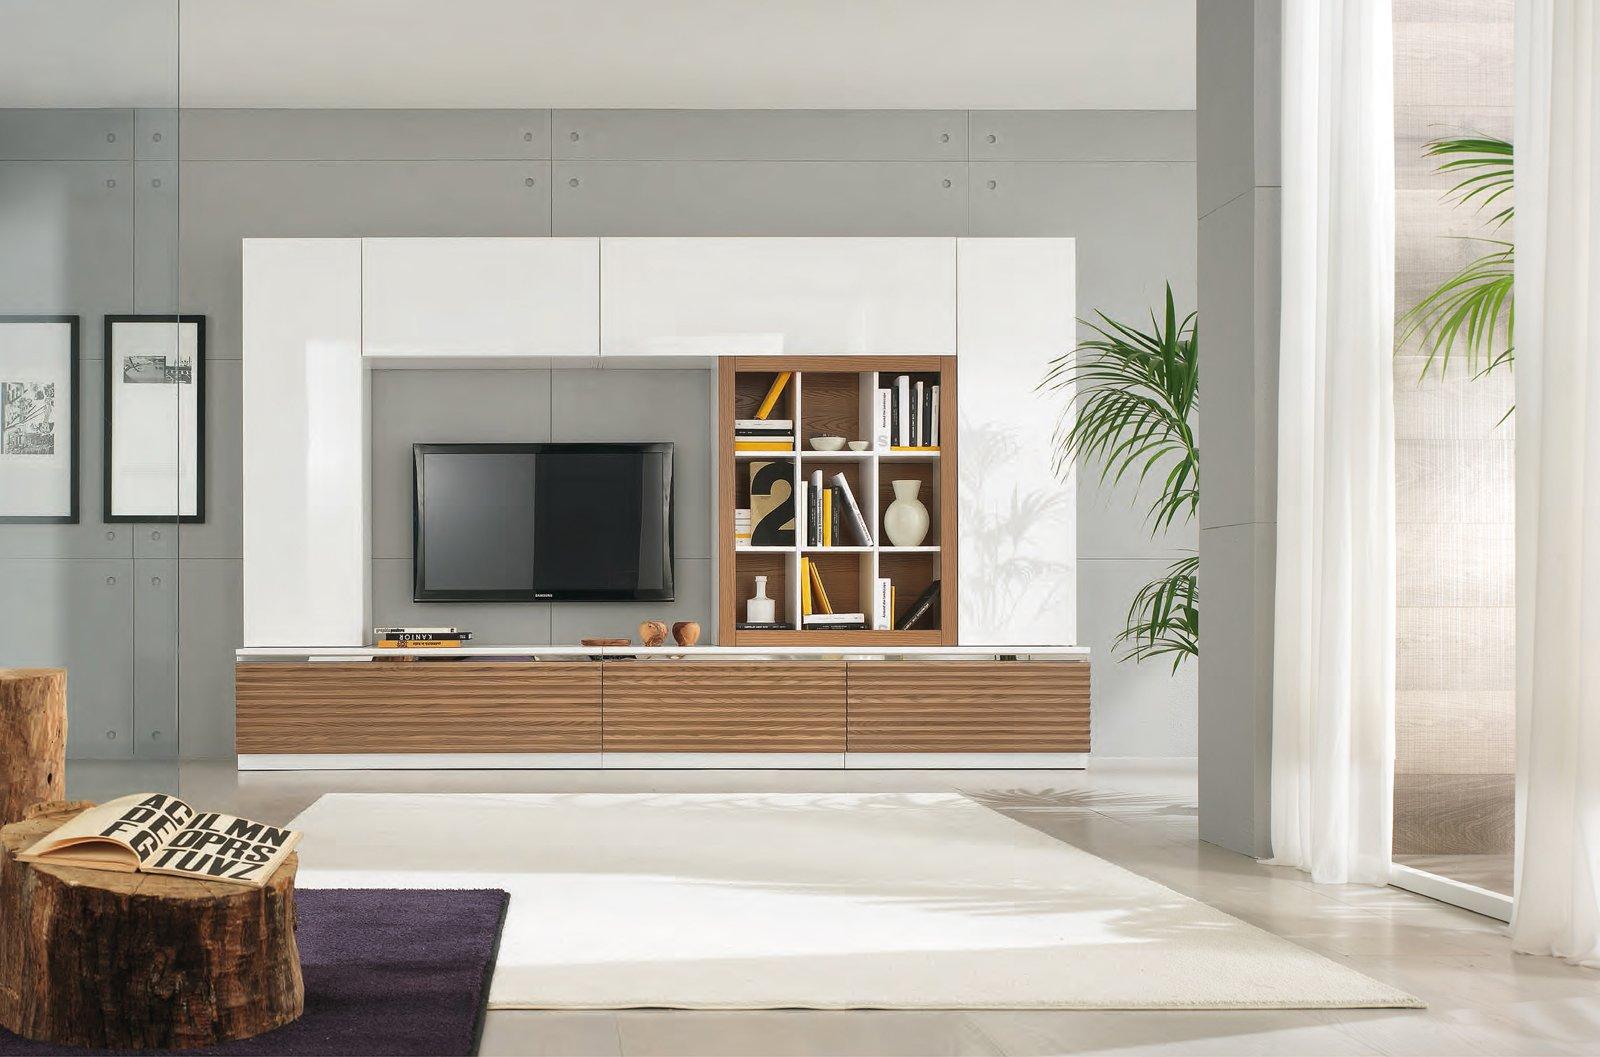 Casa moderna roma italy mobili divisori per soggiorno for Piccoli mobili per soggiorno